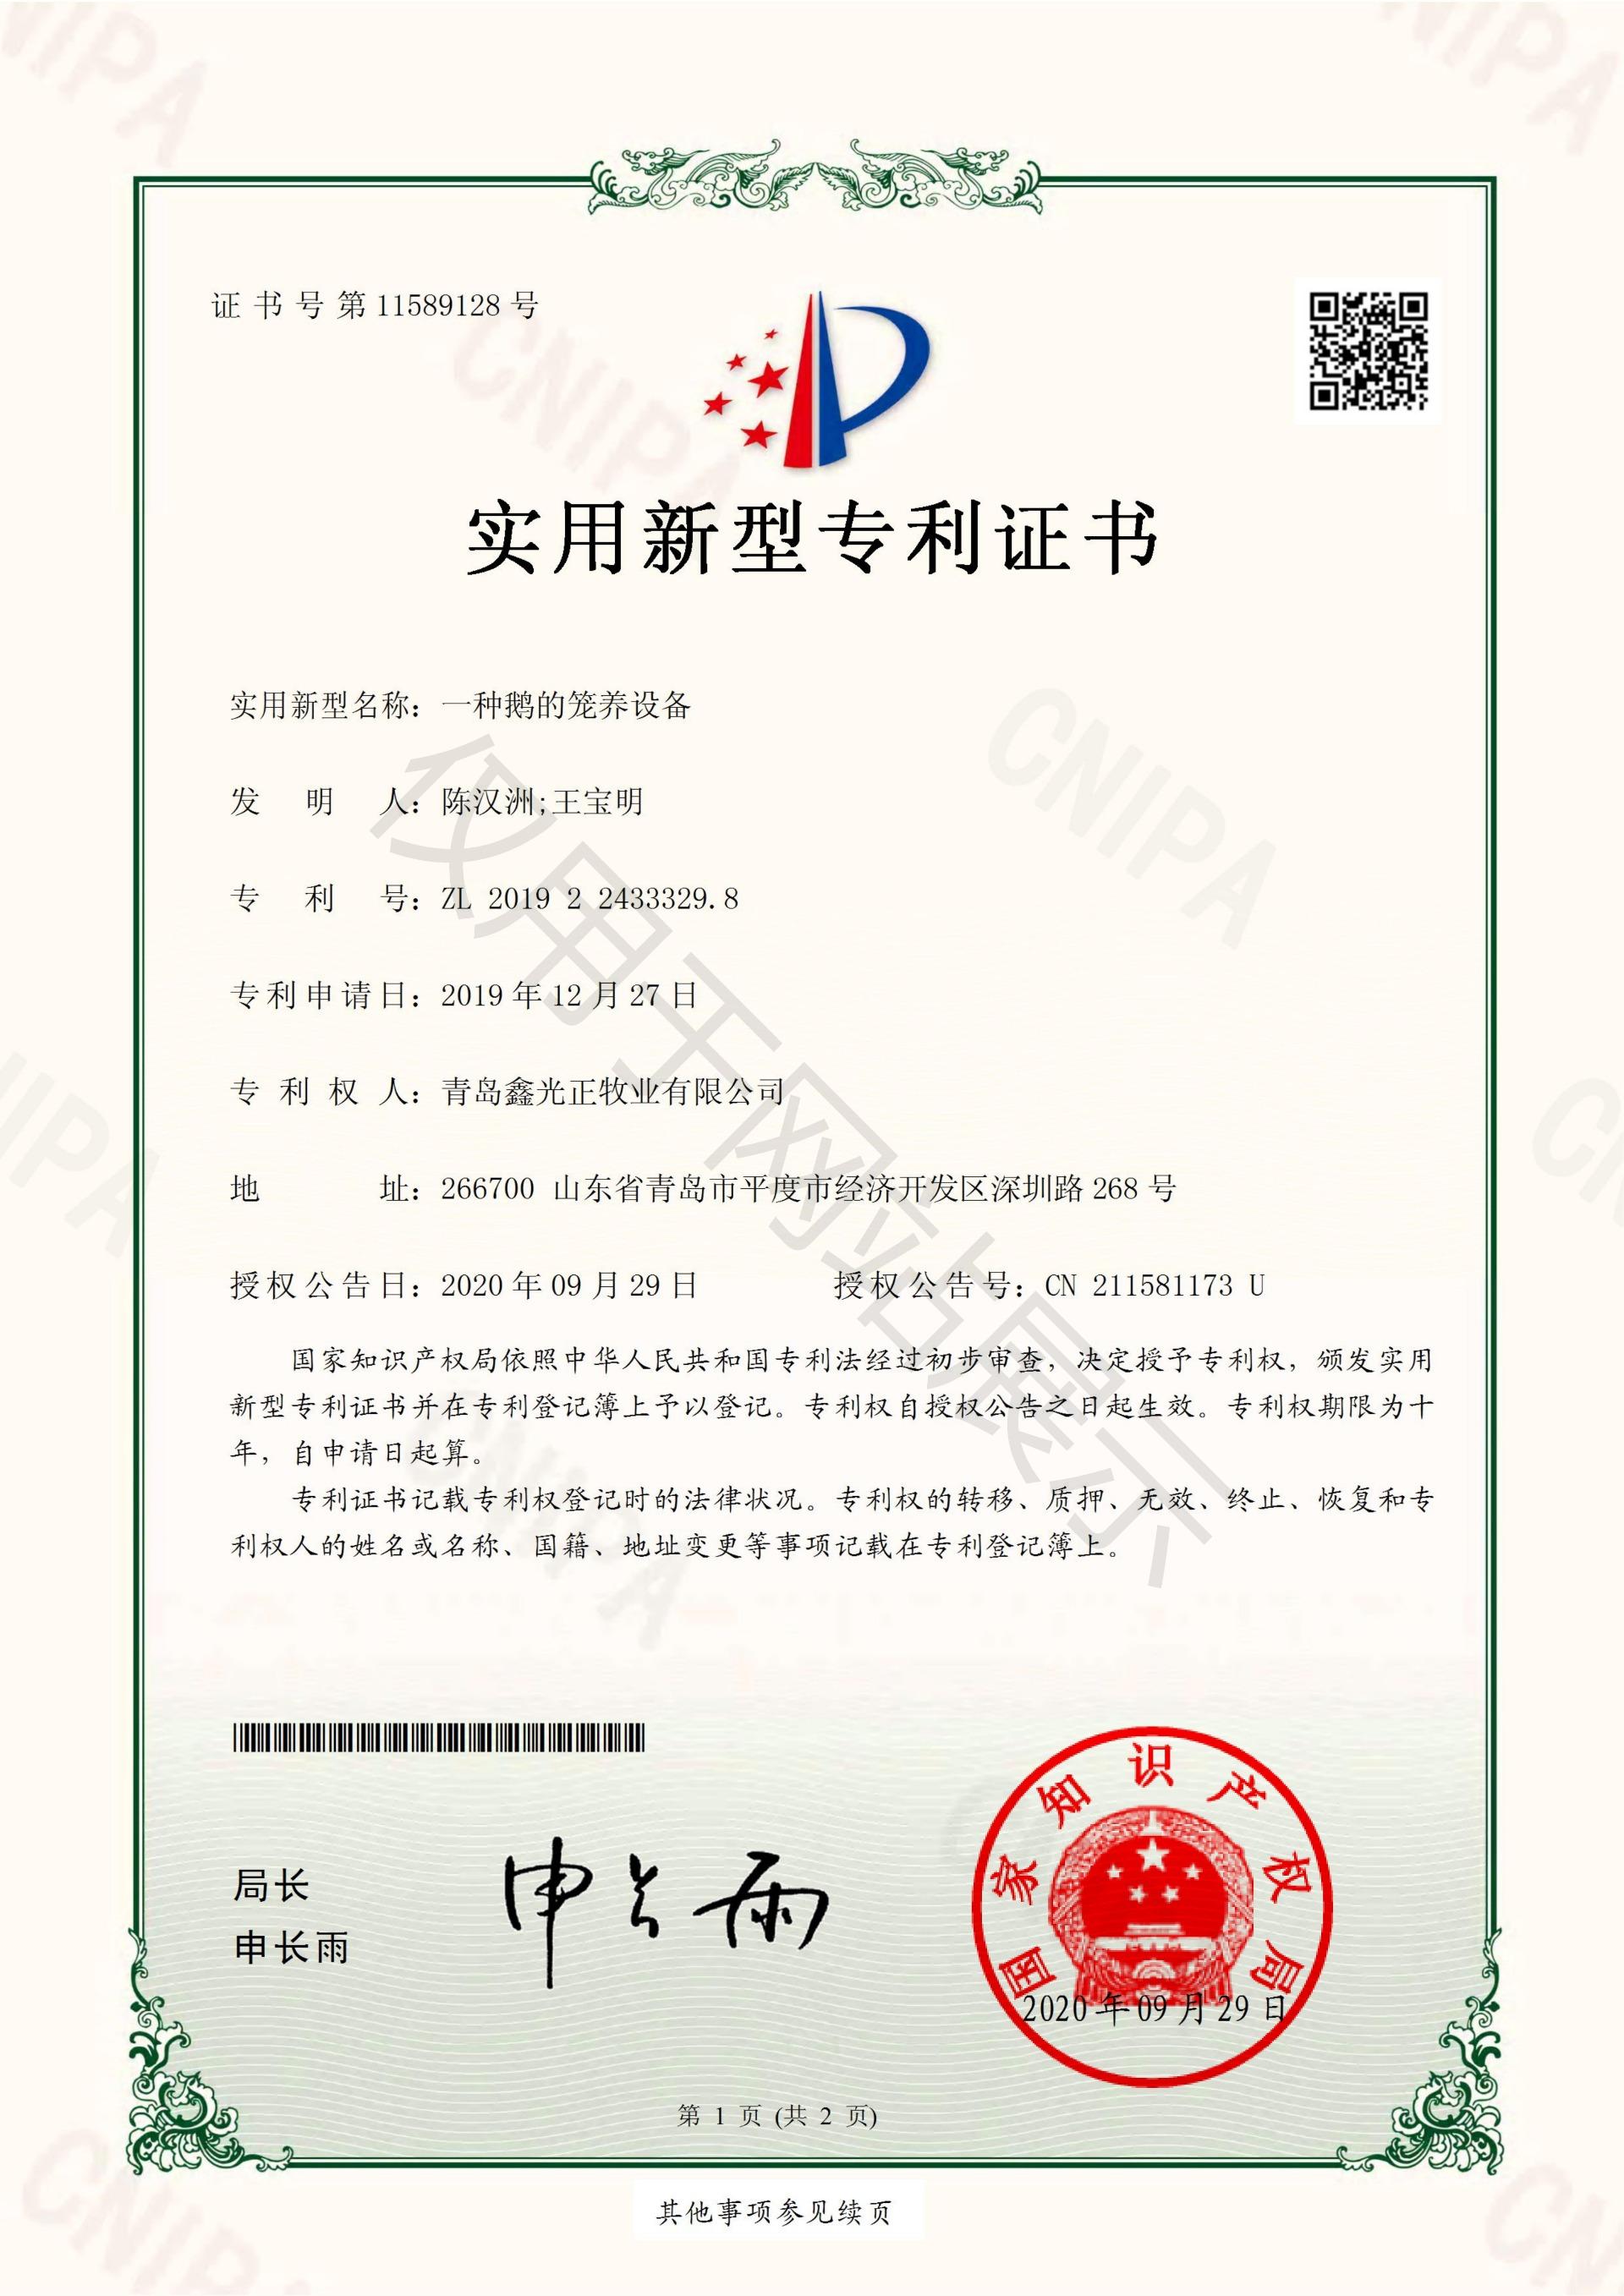 GZD2201912271727-一种鹅的笼养设备-实用新型专利证书(签章)_00